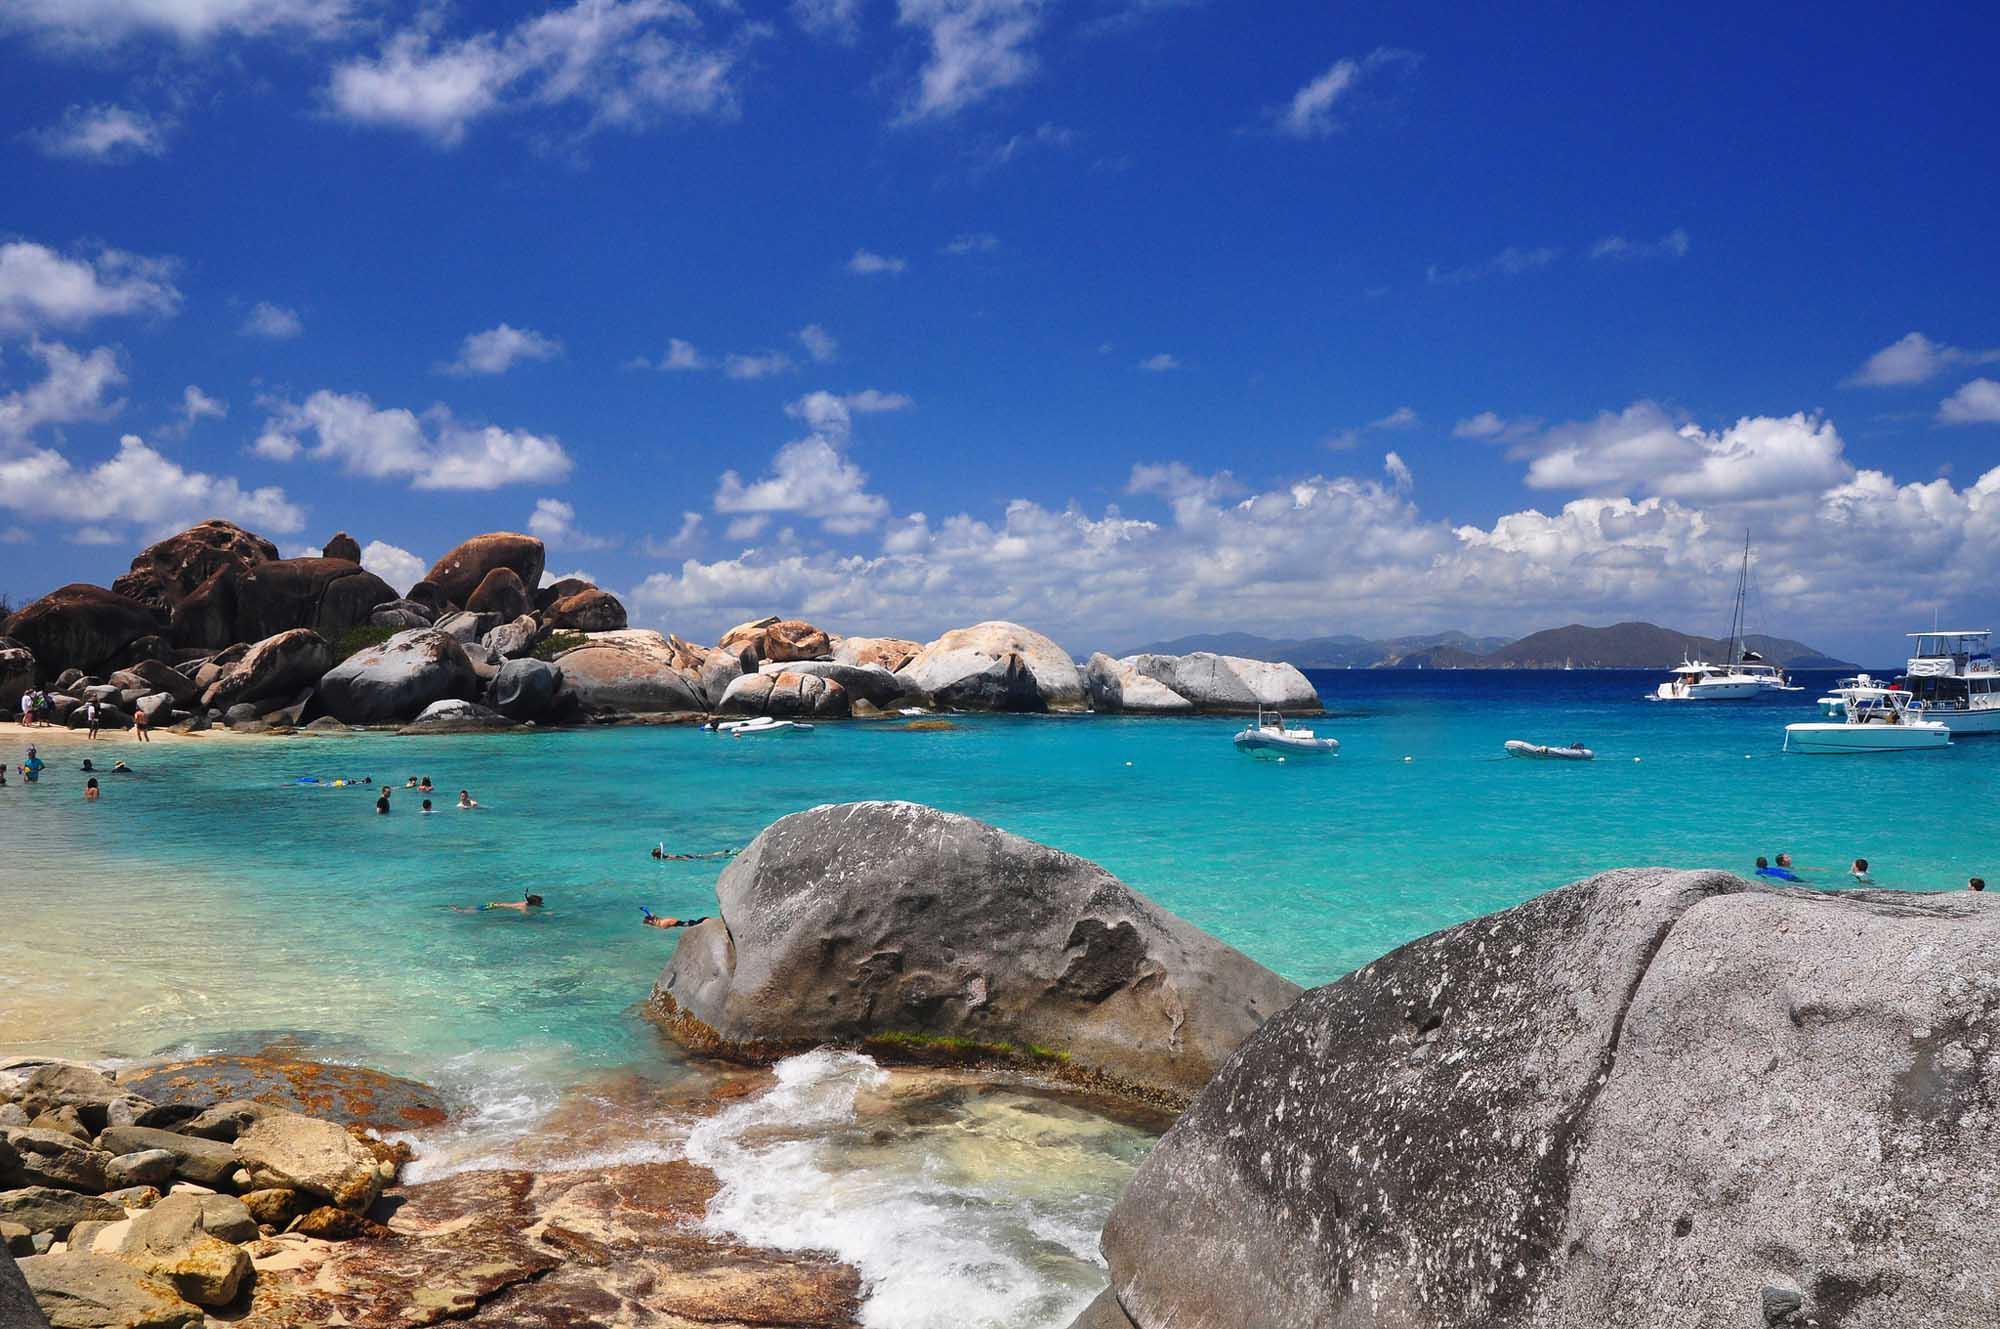 The Baths, Virgin Gorda Island, British Virgin Islands, West Indies  № 1471479 бесплатно